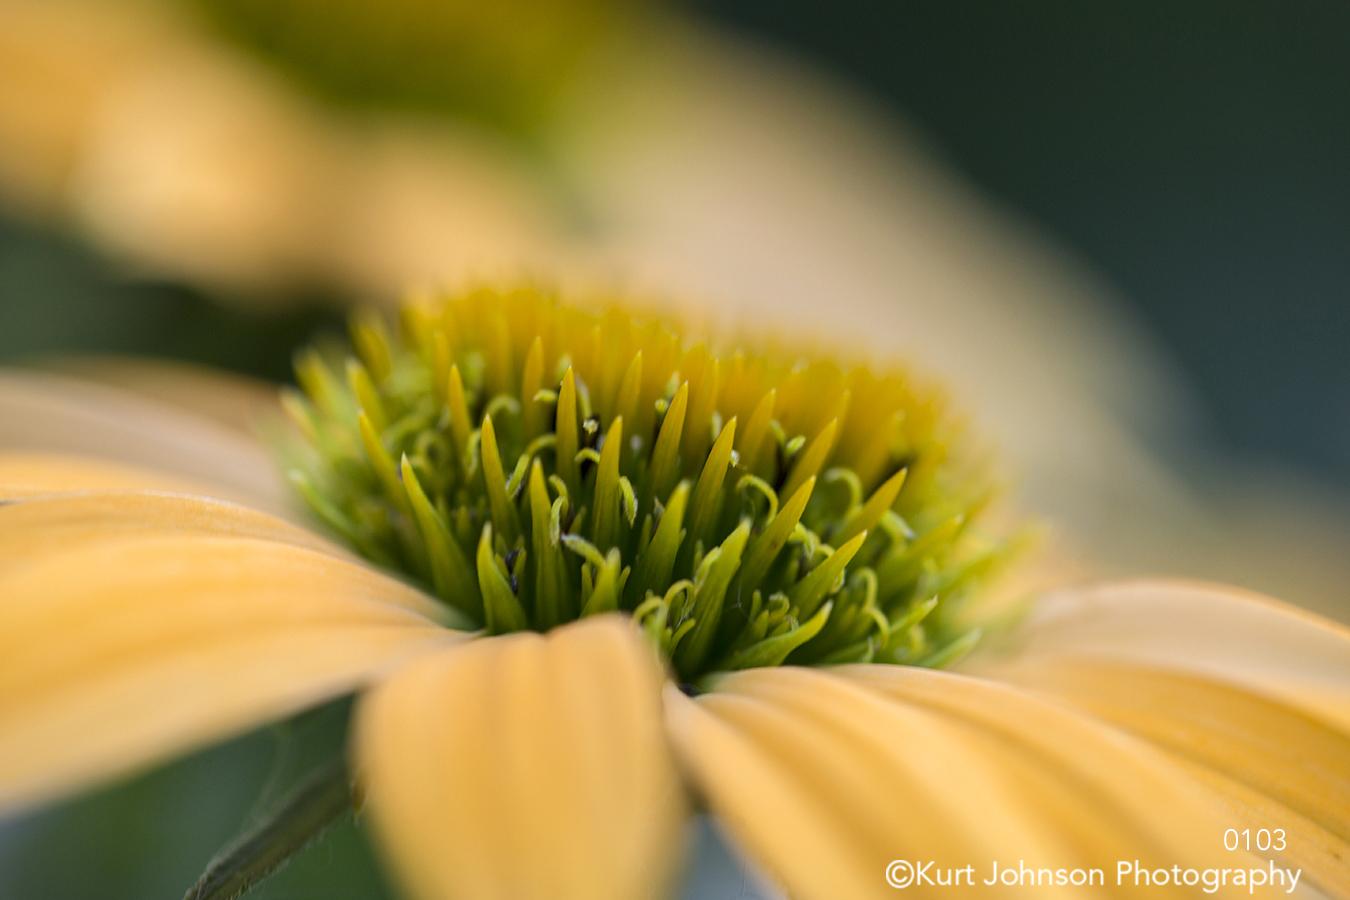 yellow flower flowers petal petals bloom daisy green